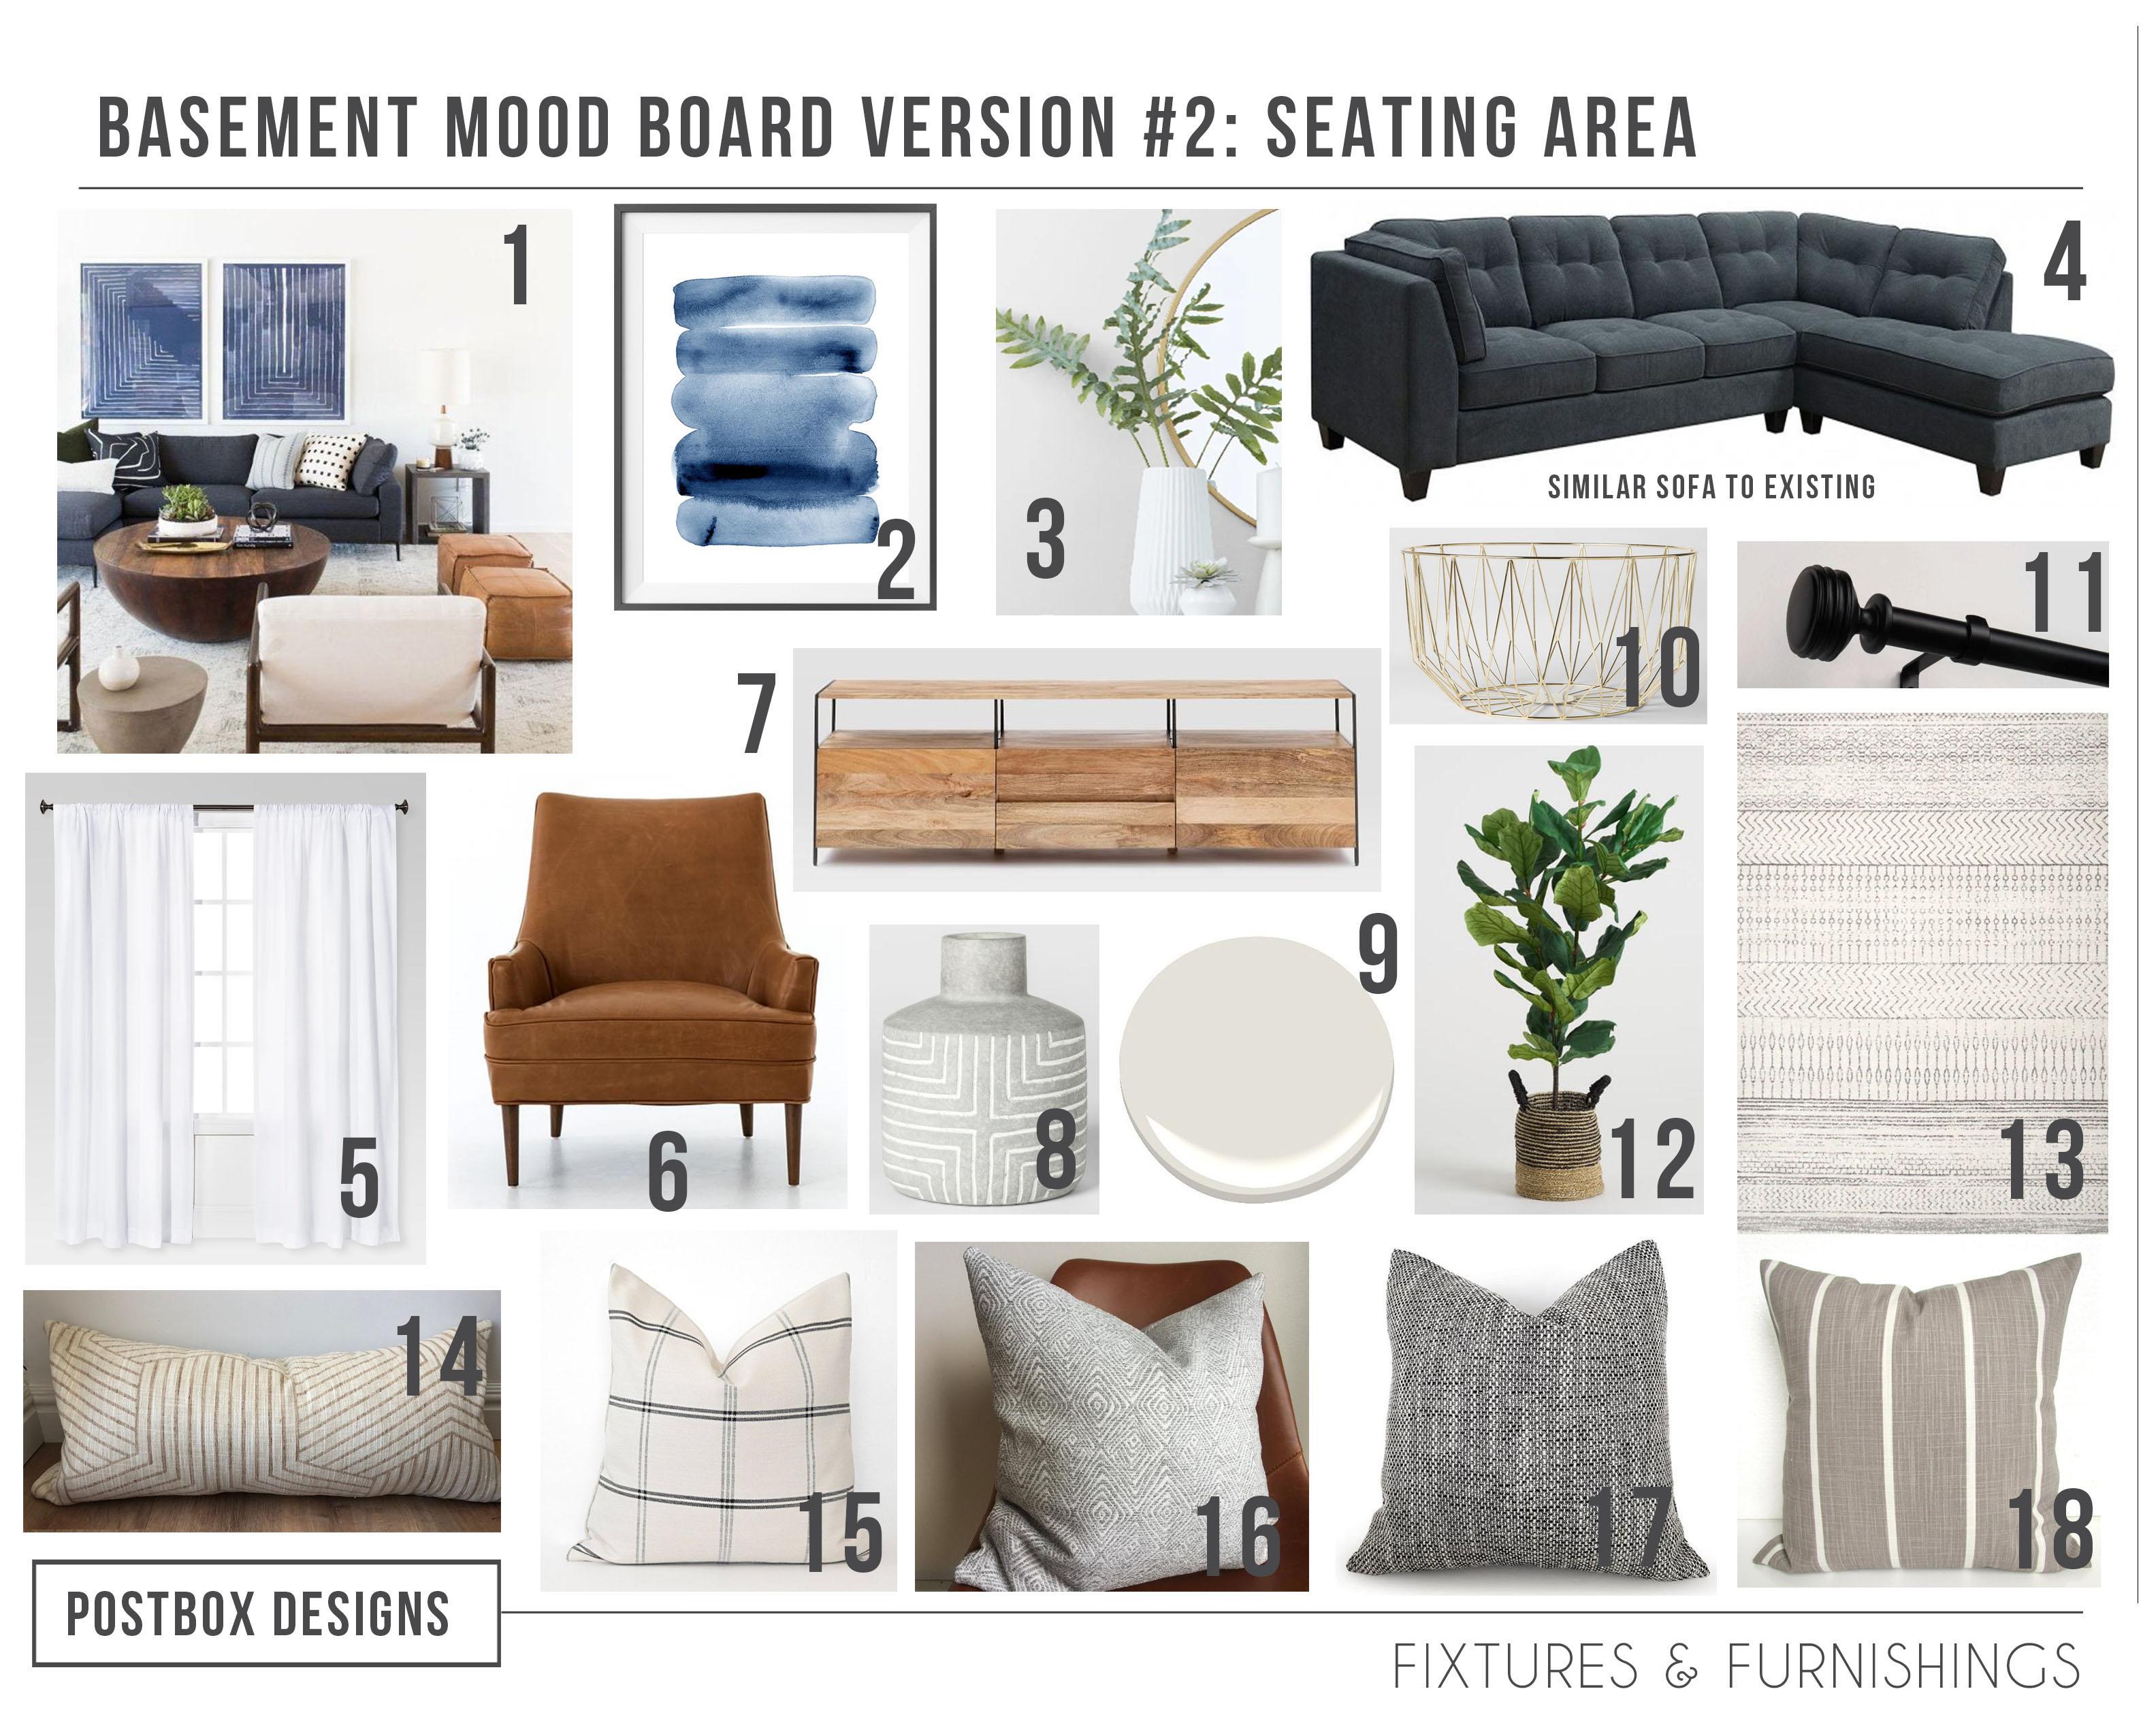 Postbox-Designs-Online-Interior-Design-How-It-Works-E-Design